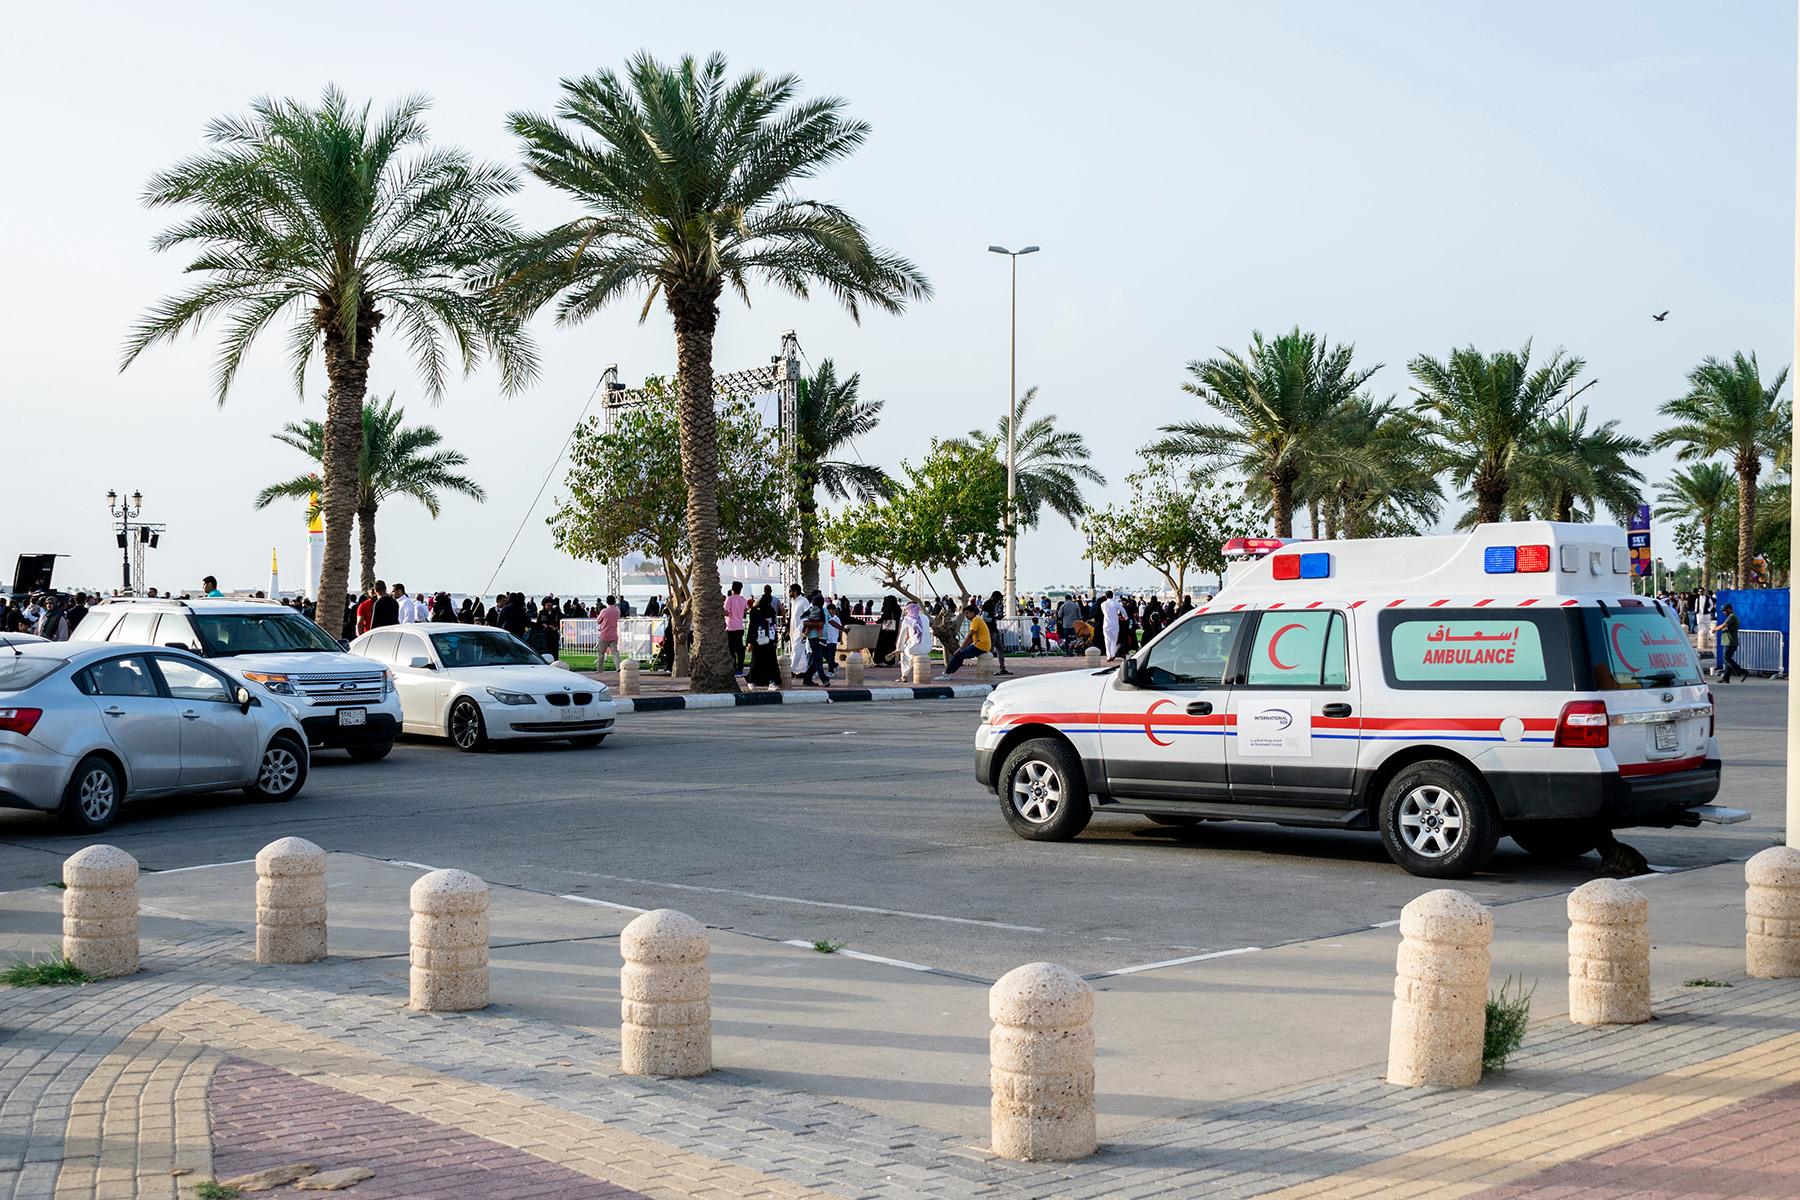 Ambulance waiting at a beach in Saudi Arabia